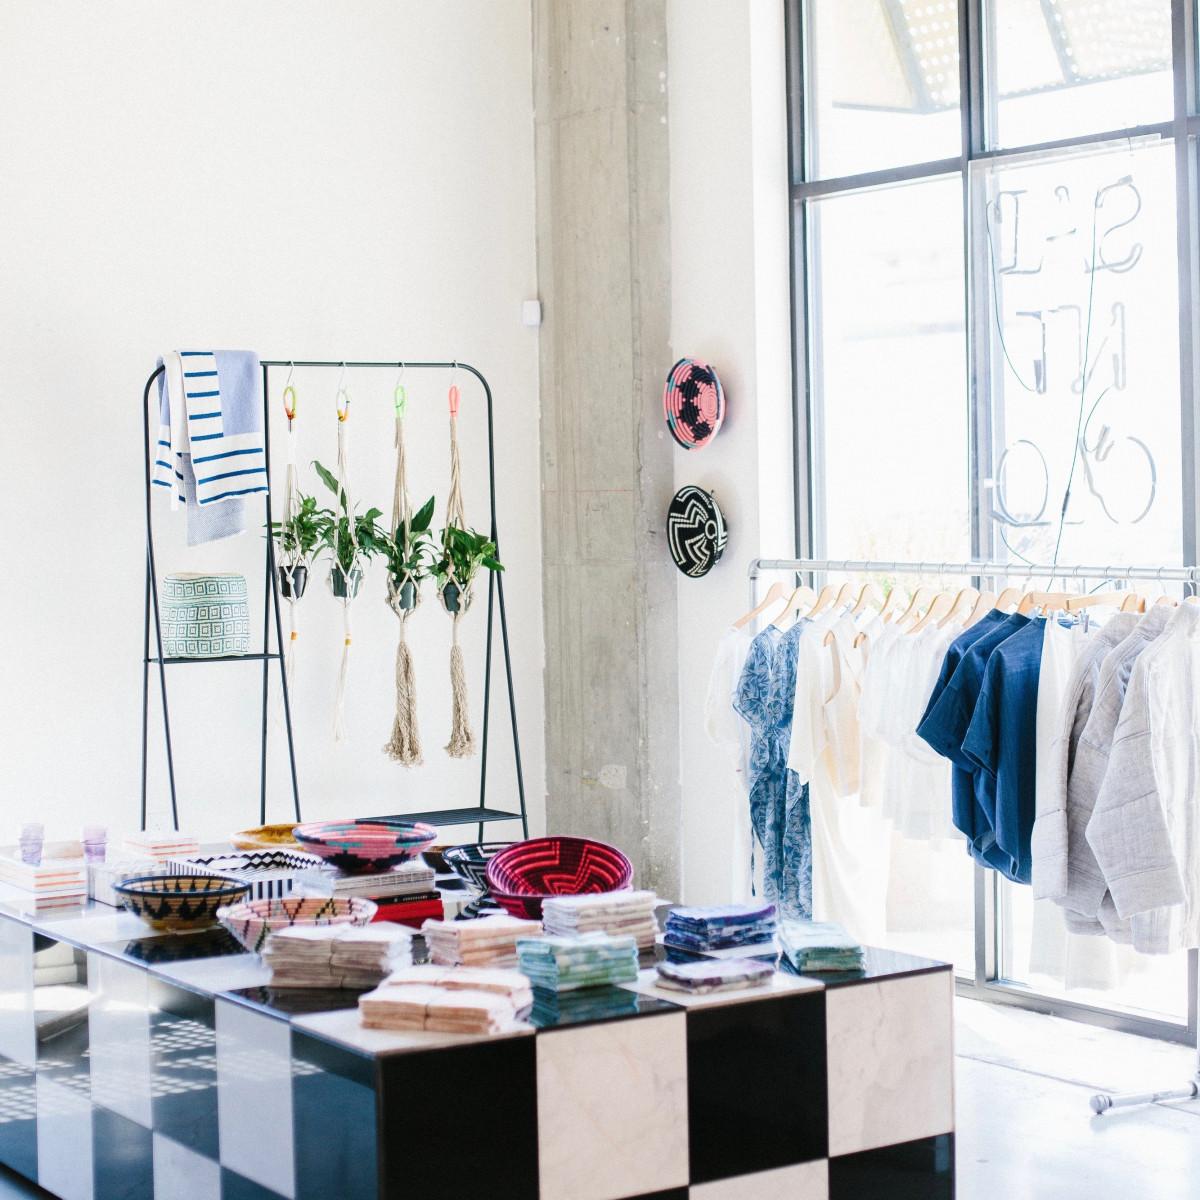 Where to shop july 2017 Saint Cloud